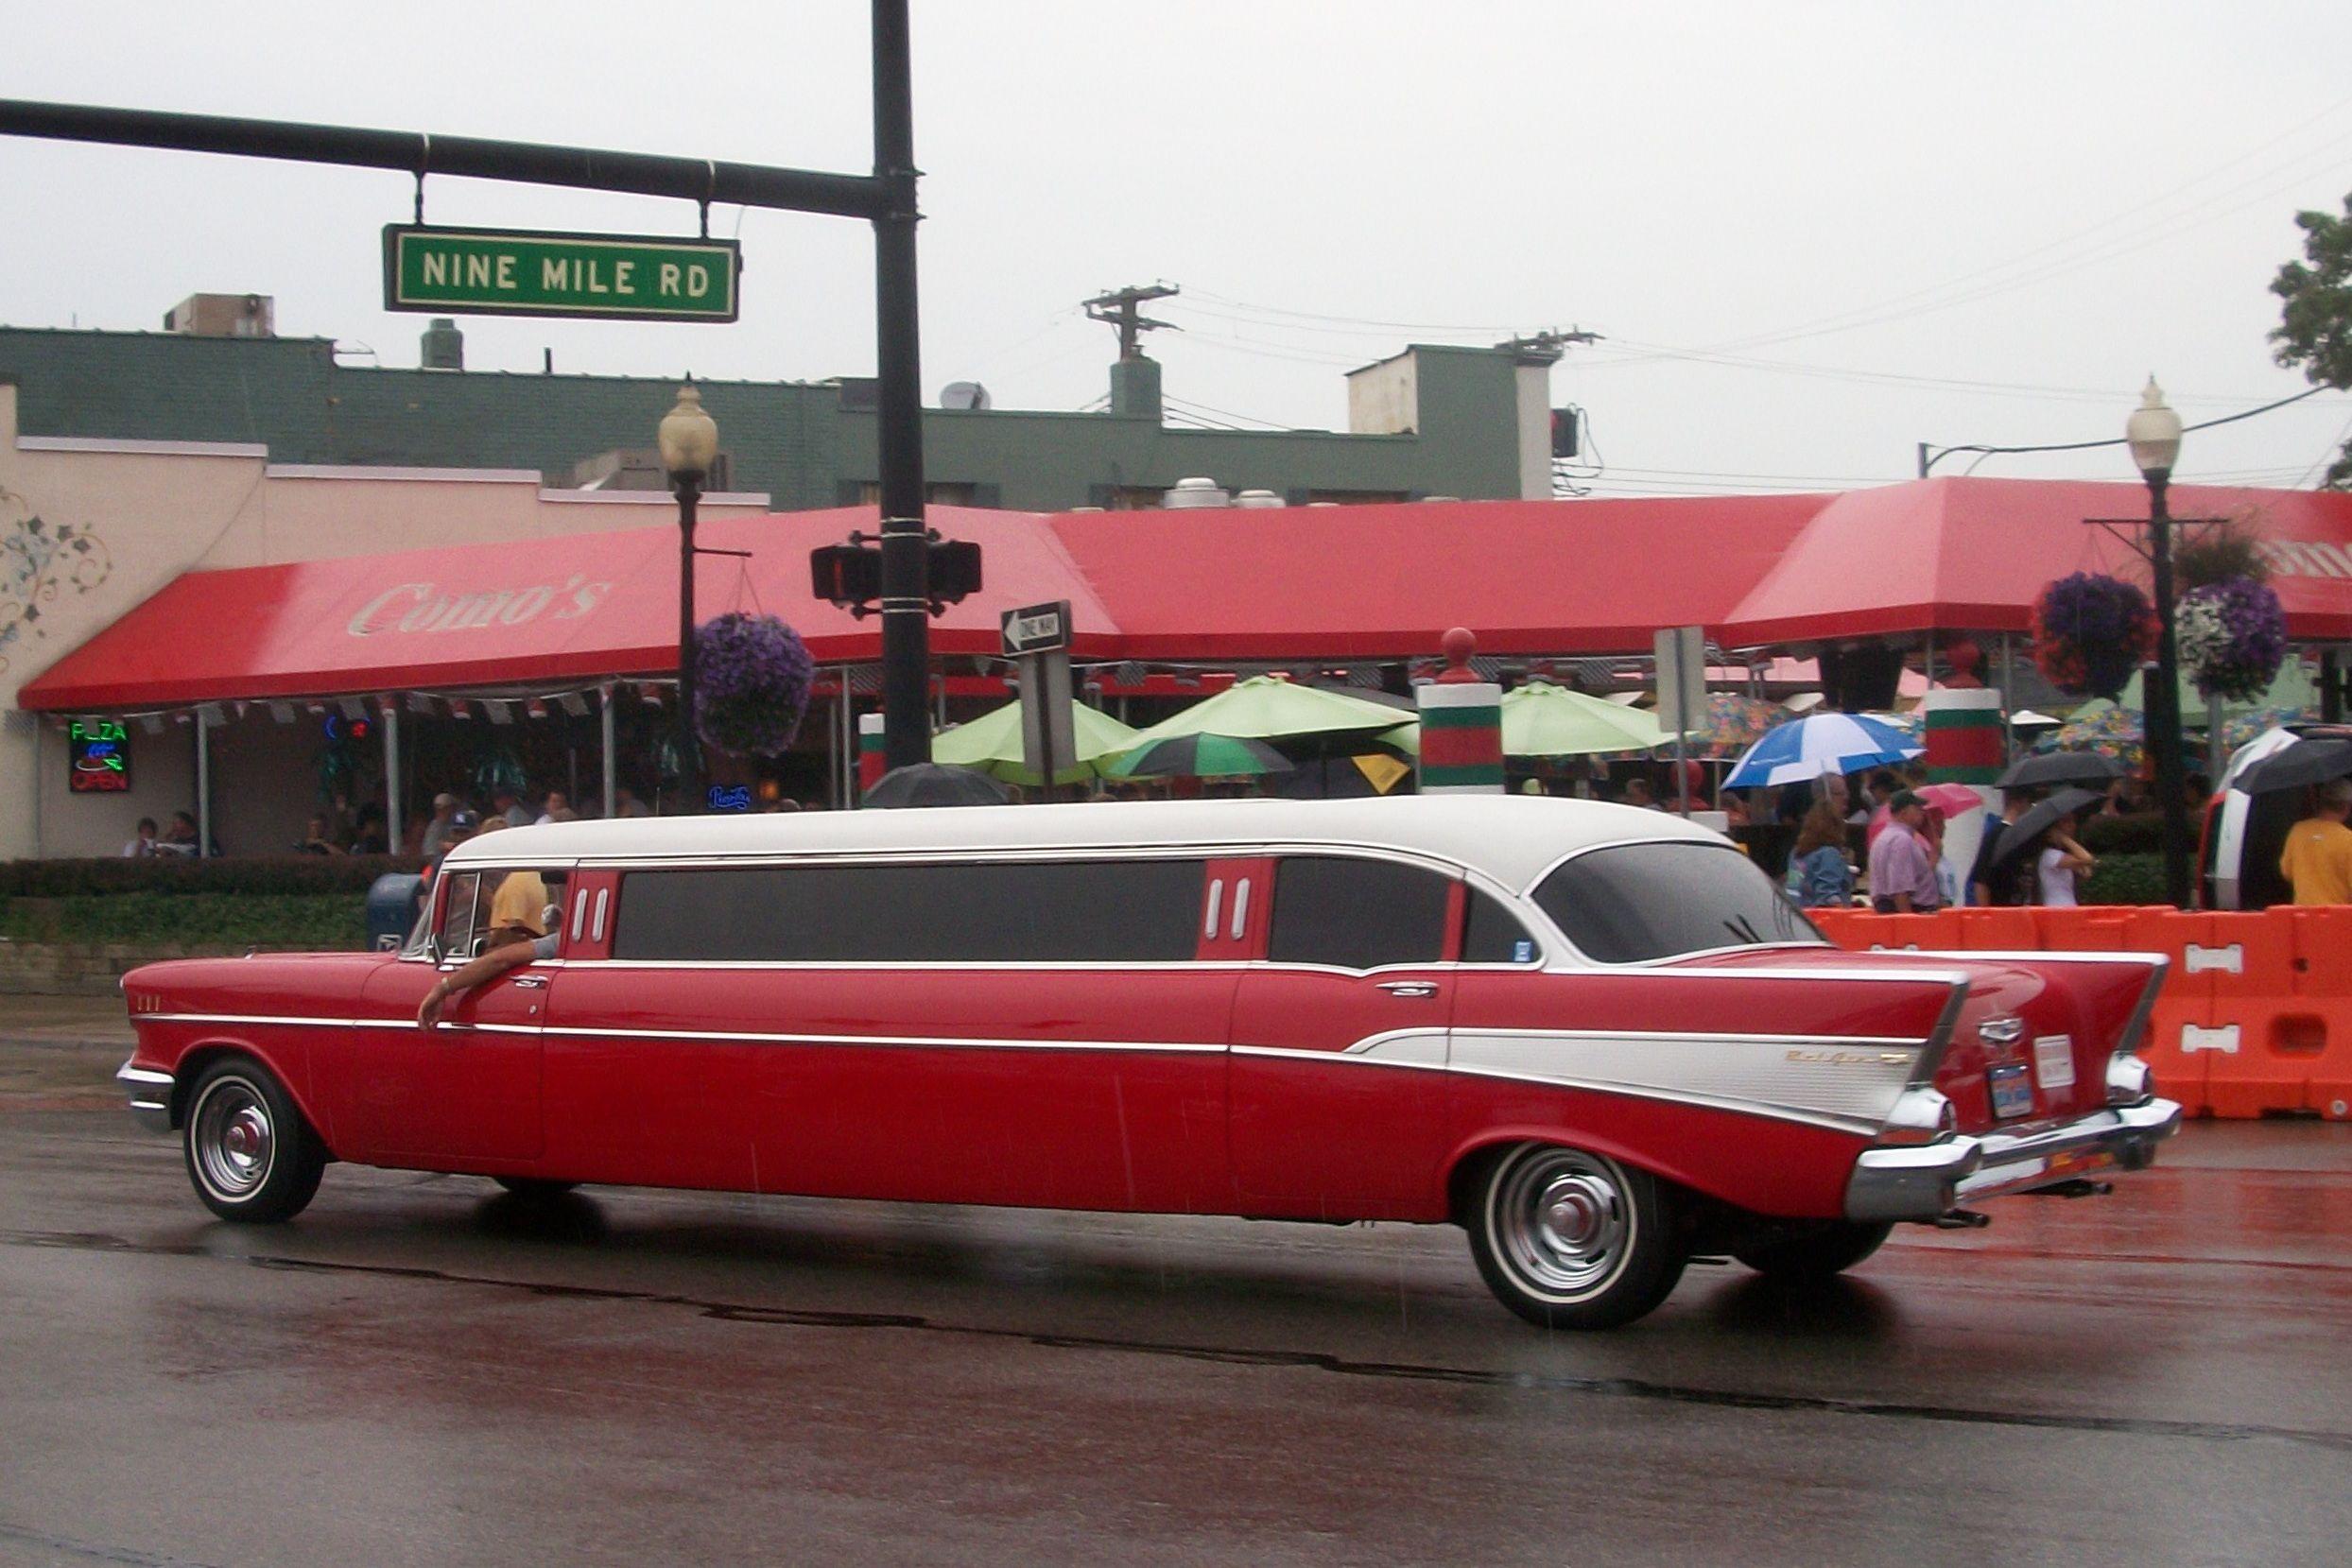 Image Result For Black Chevy Impala Wedding Car Hire Sydney